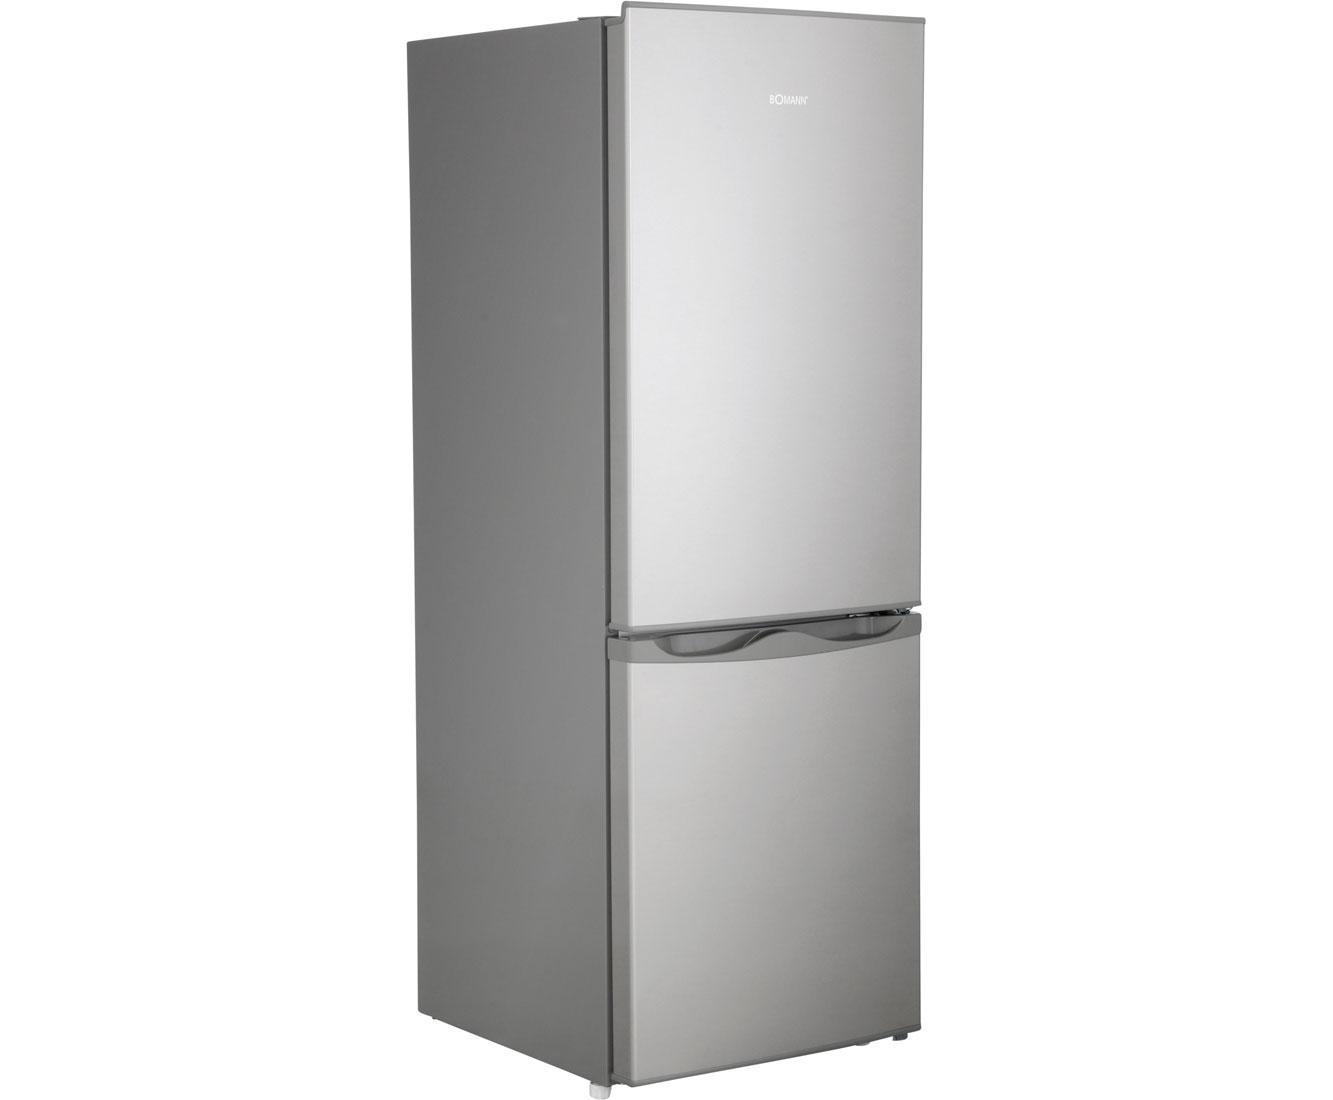 Bomann Kühlschrank Zubehör : Bomann kg kühl gefrierkombination edelstahl optik a